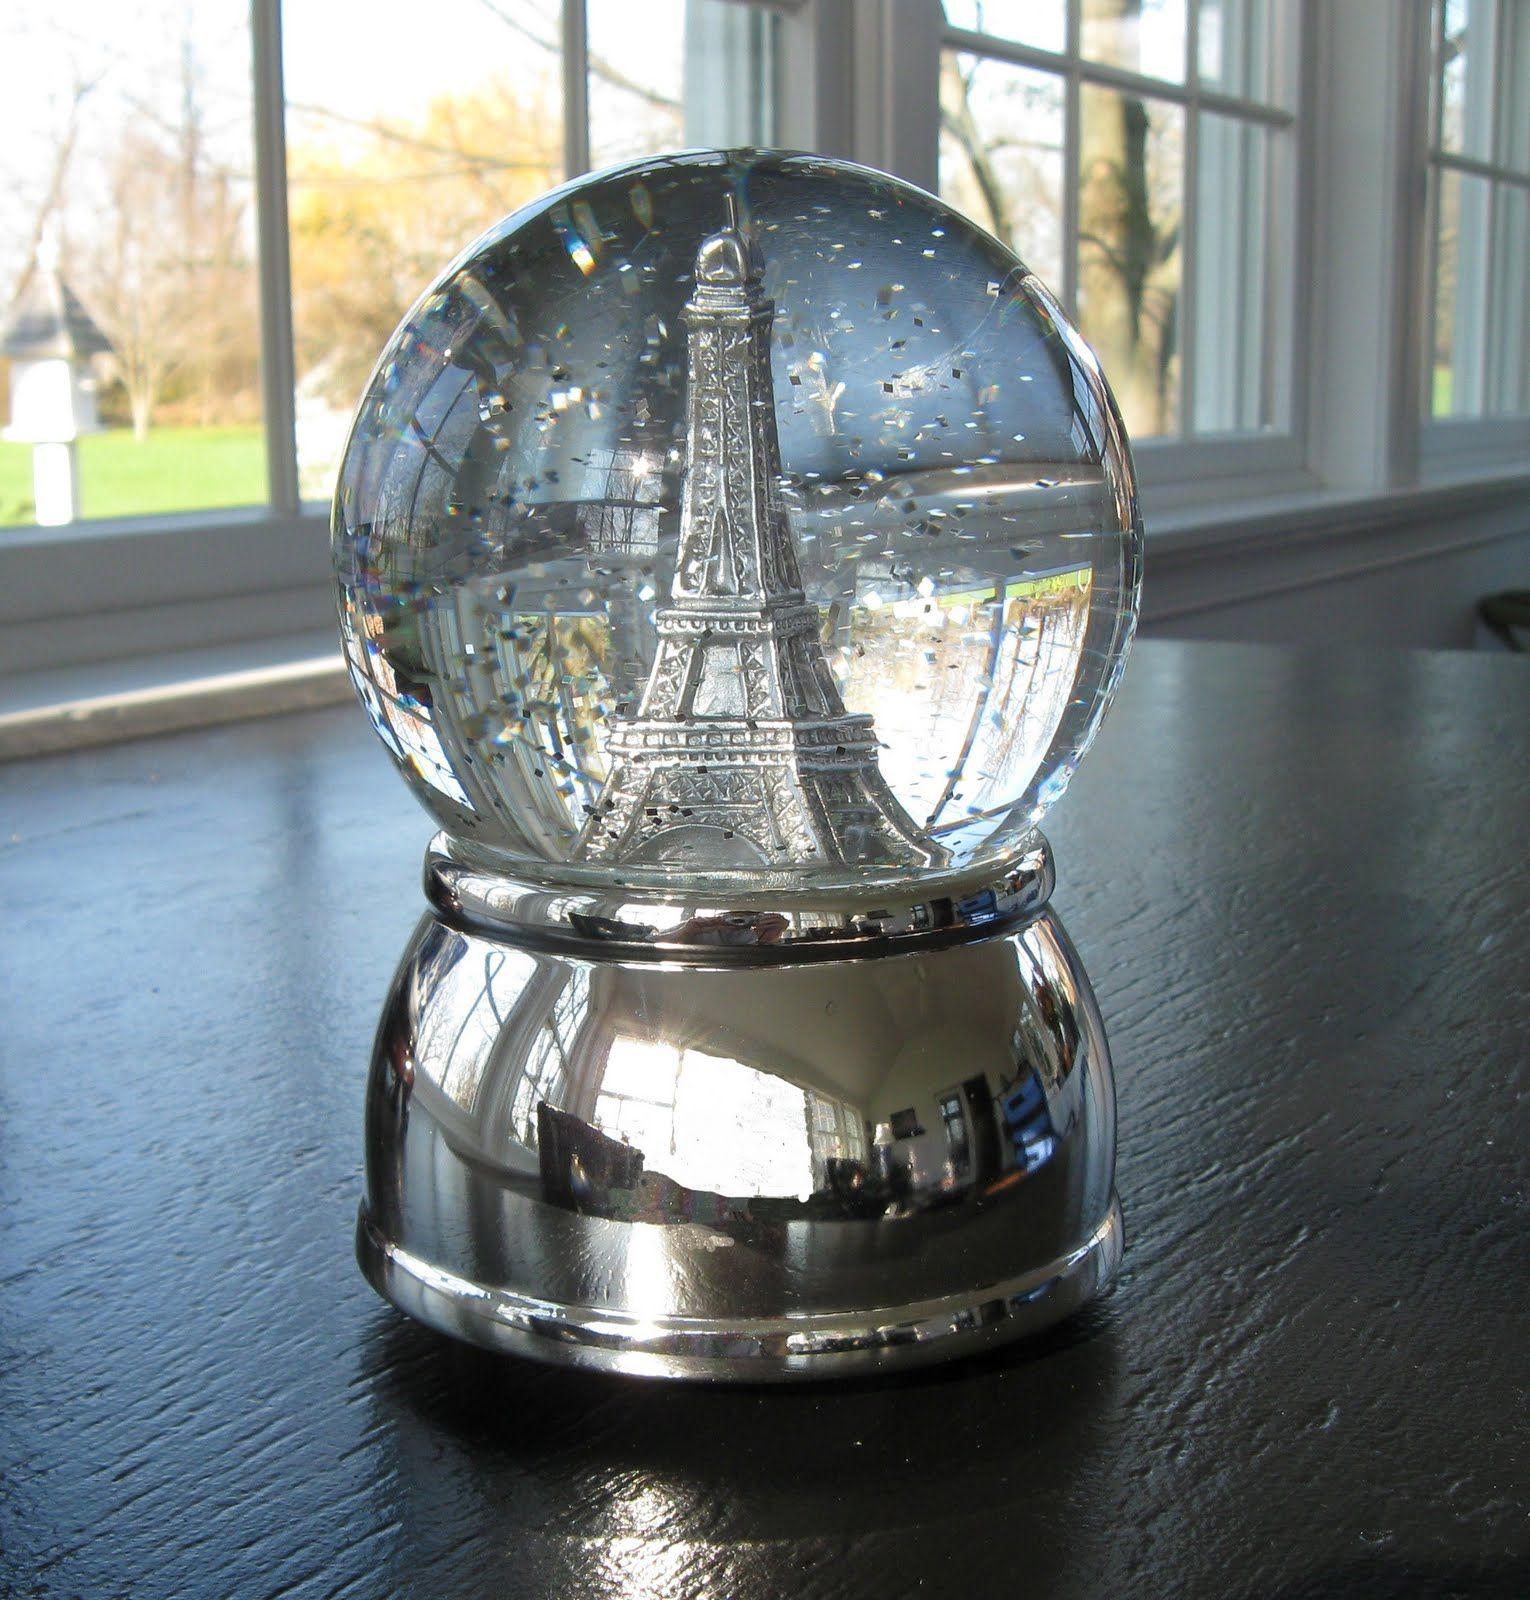 Light Tower Globes: This One Is Pretty :)....@Paula Inkrott